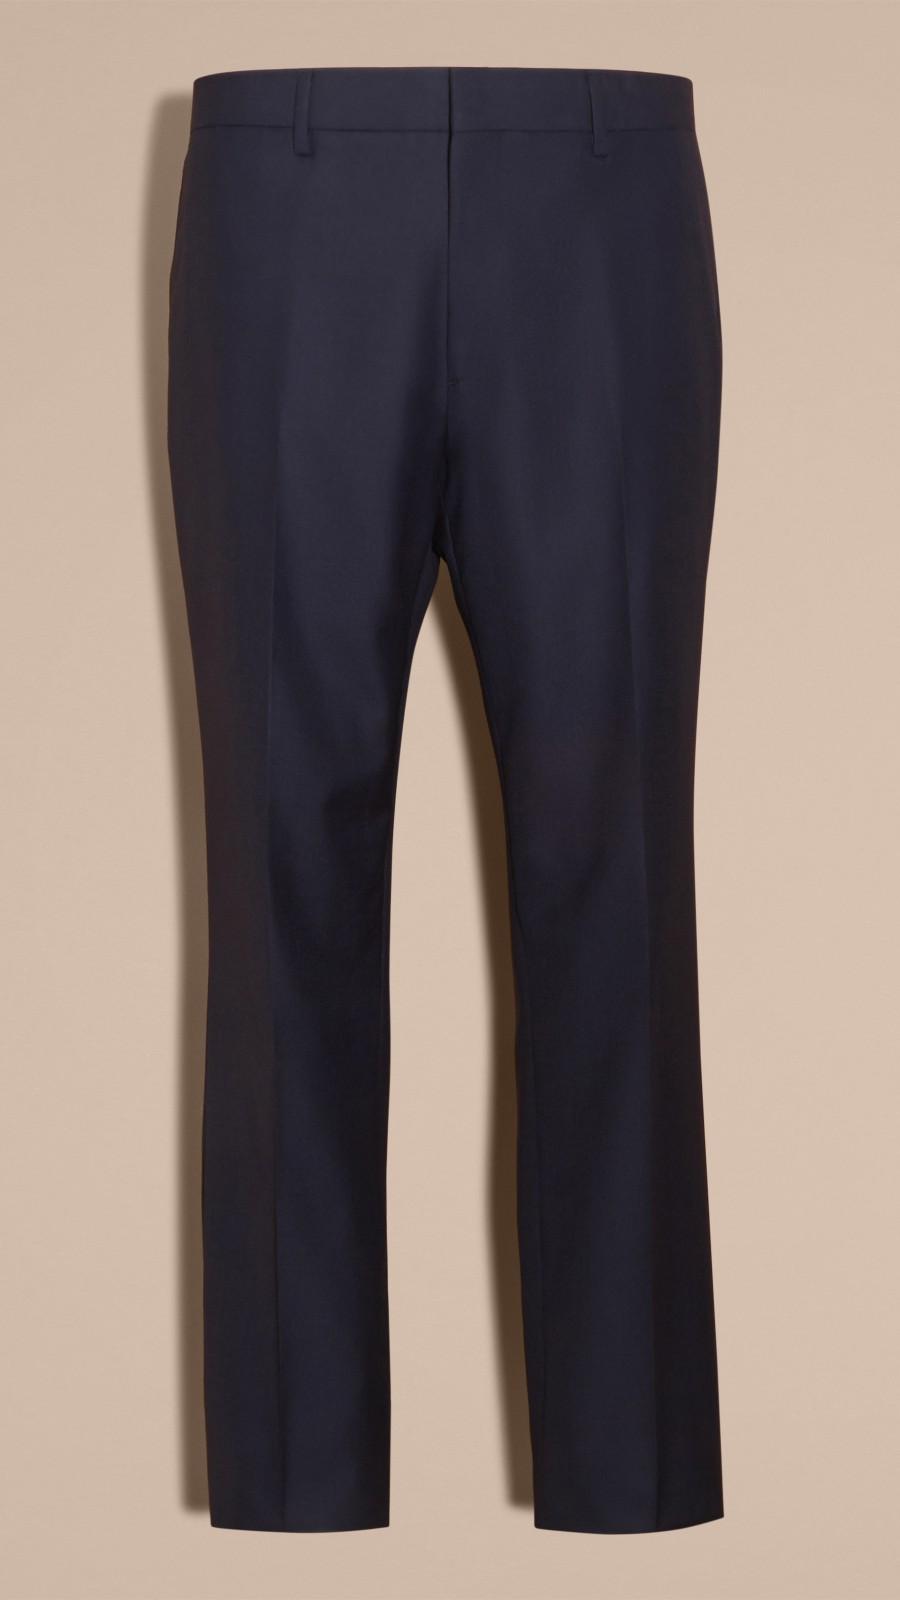 Navy Classic Fit Wool Part-canvas Suit Navy - Image 10